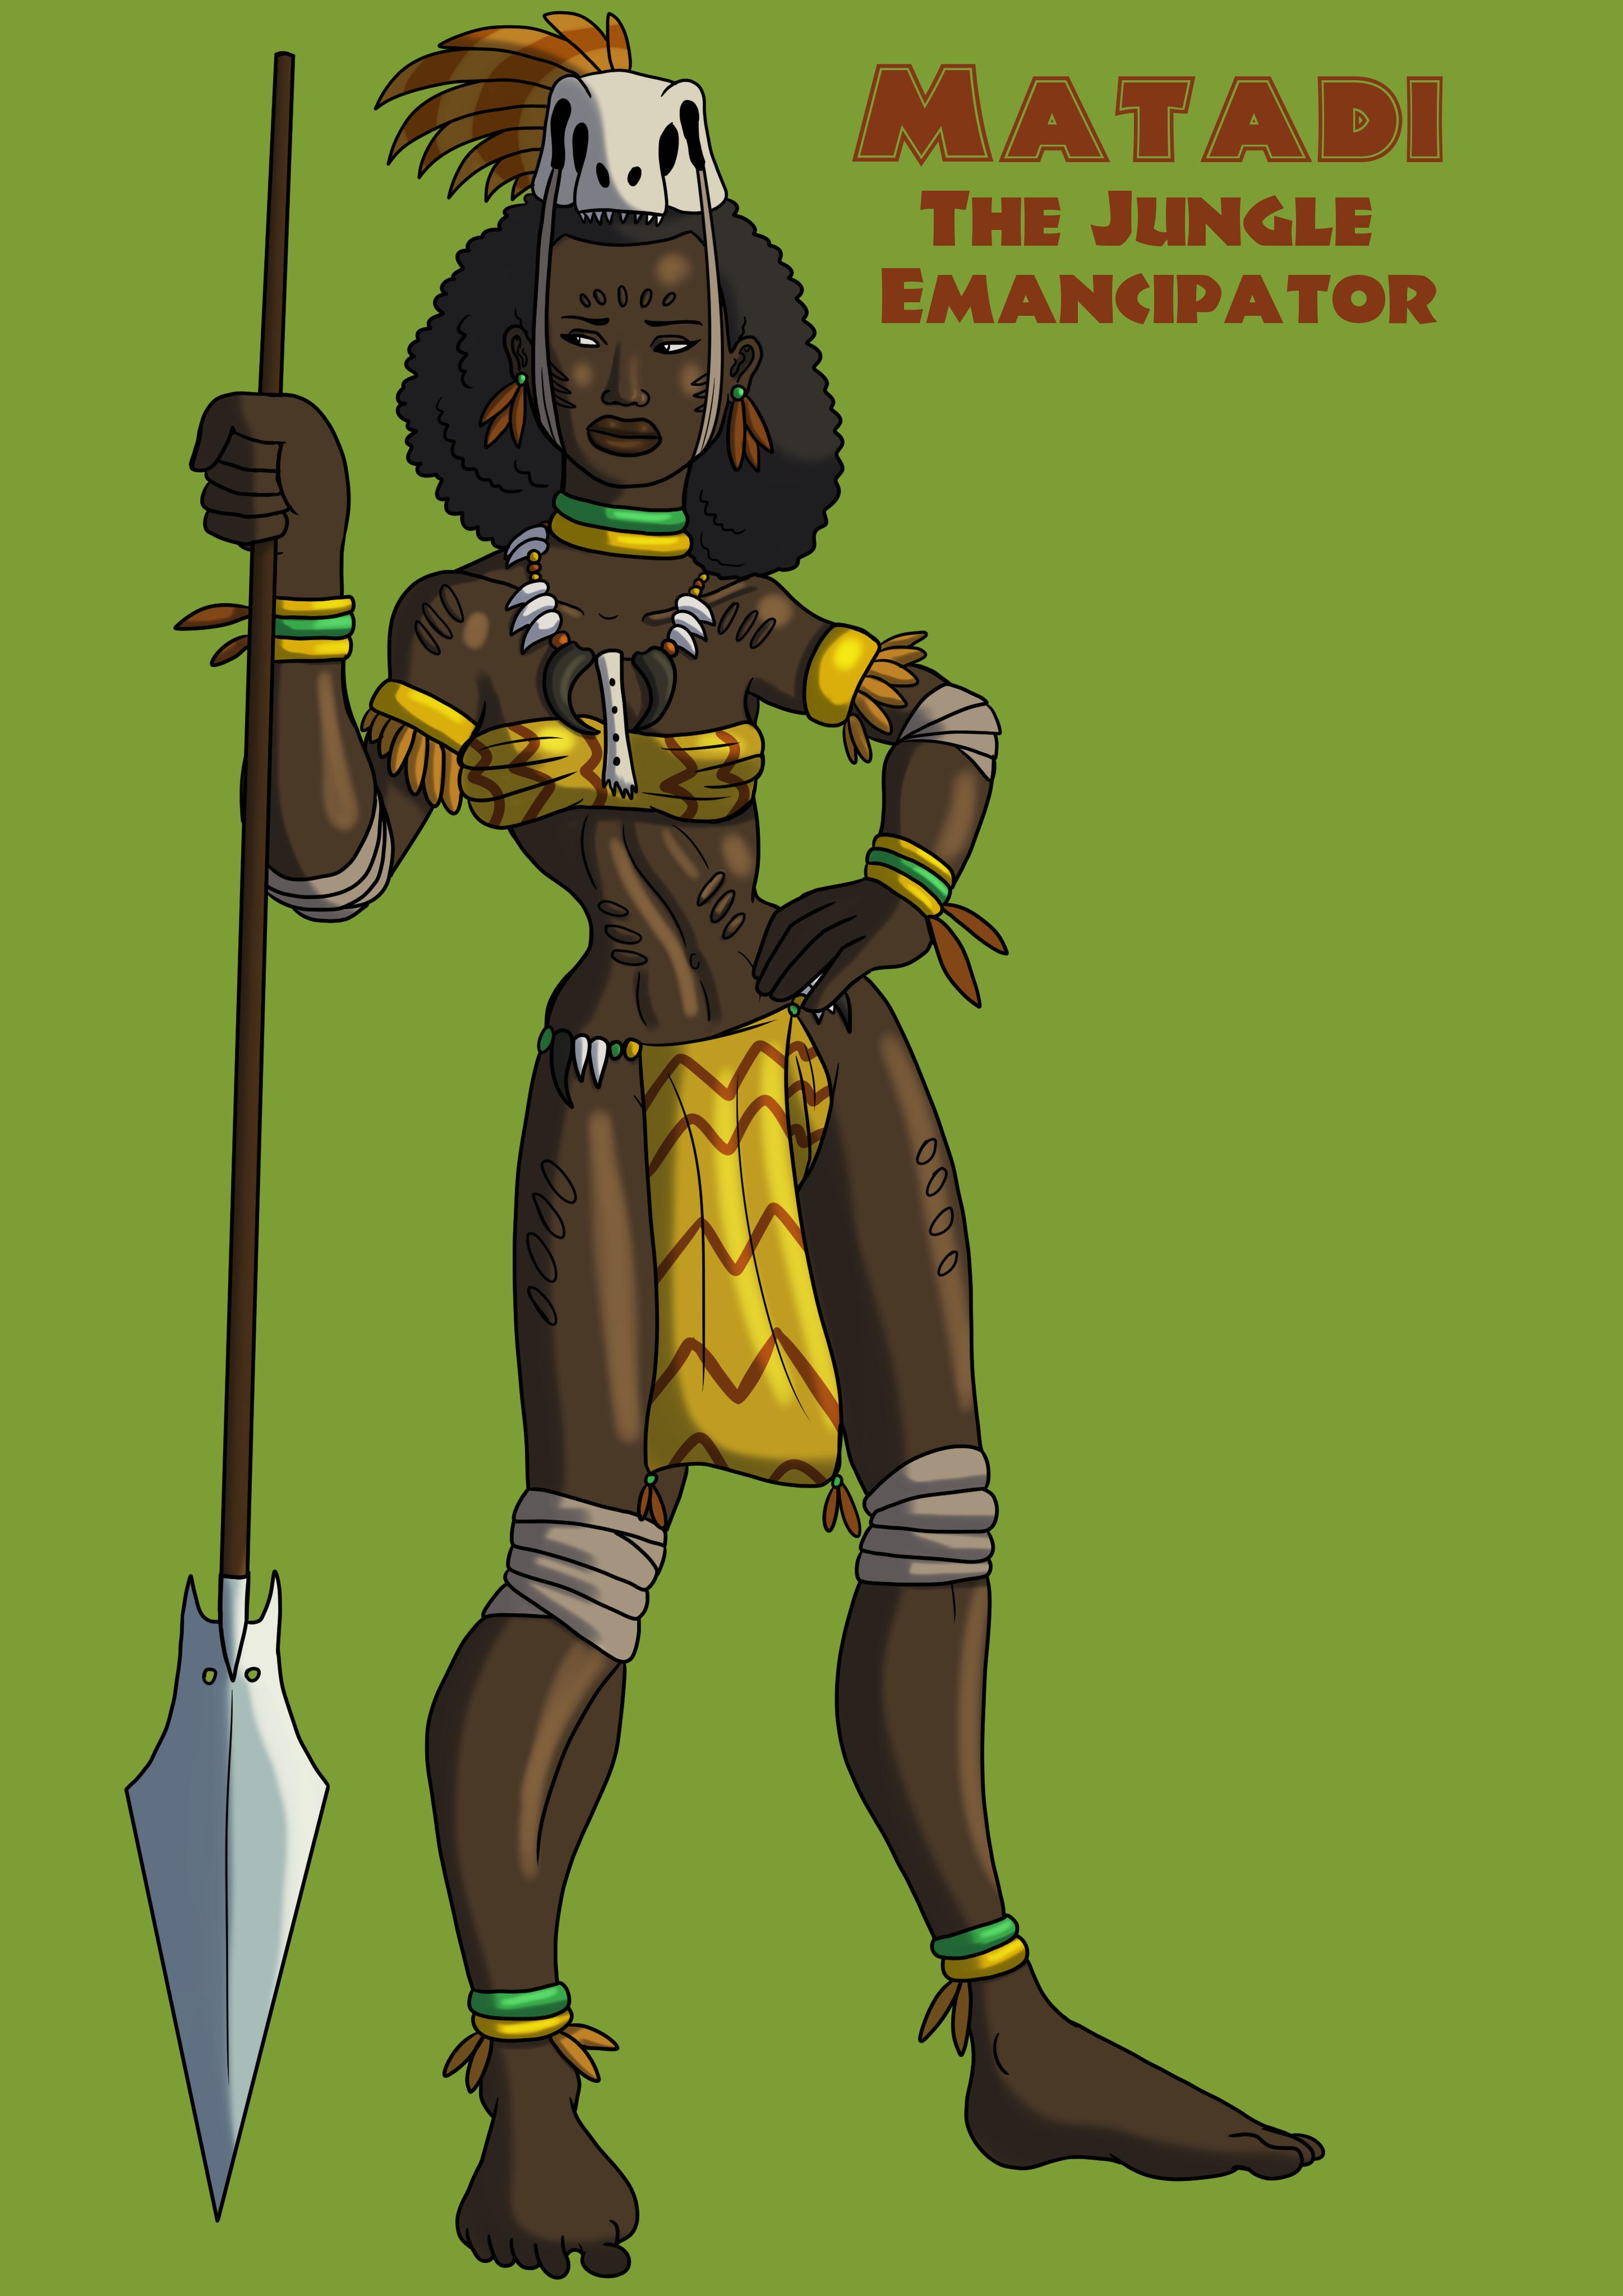 Matadi the Jungle Emancipator